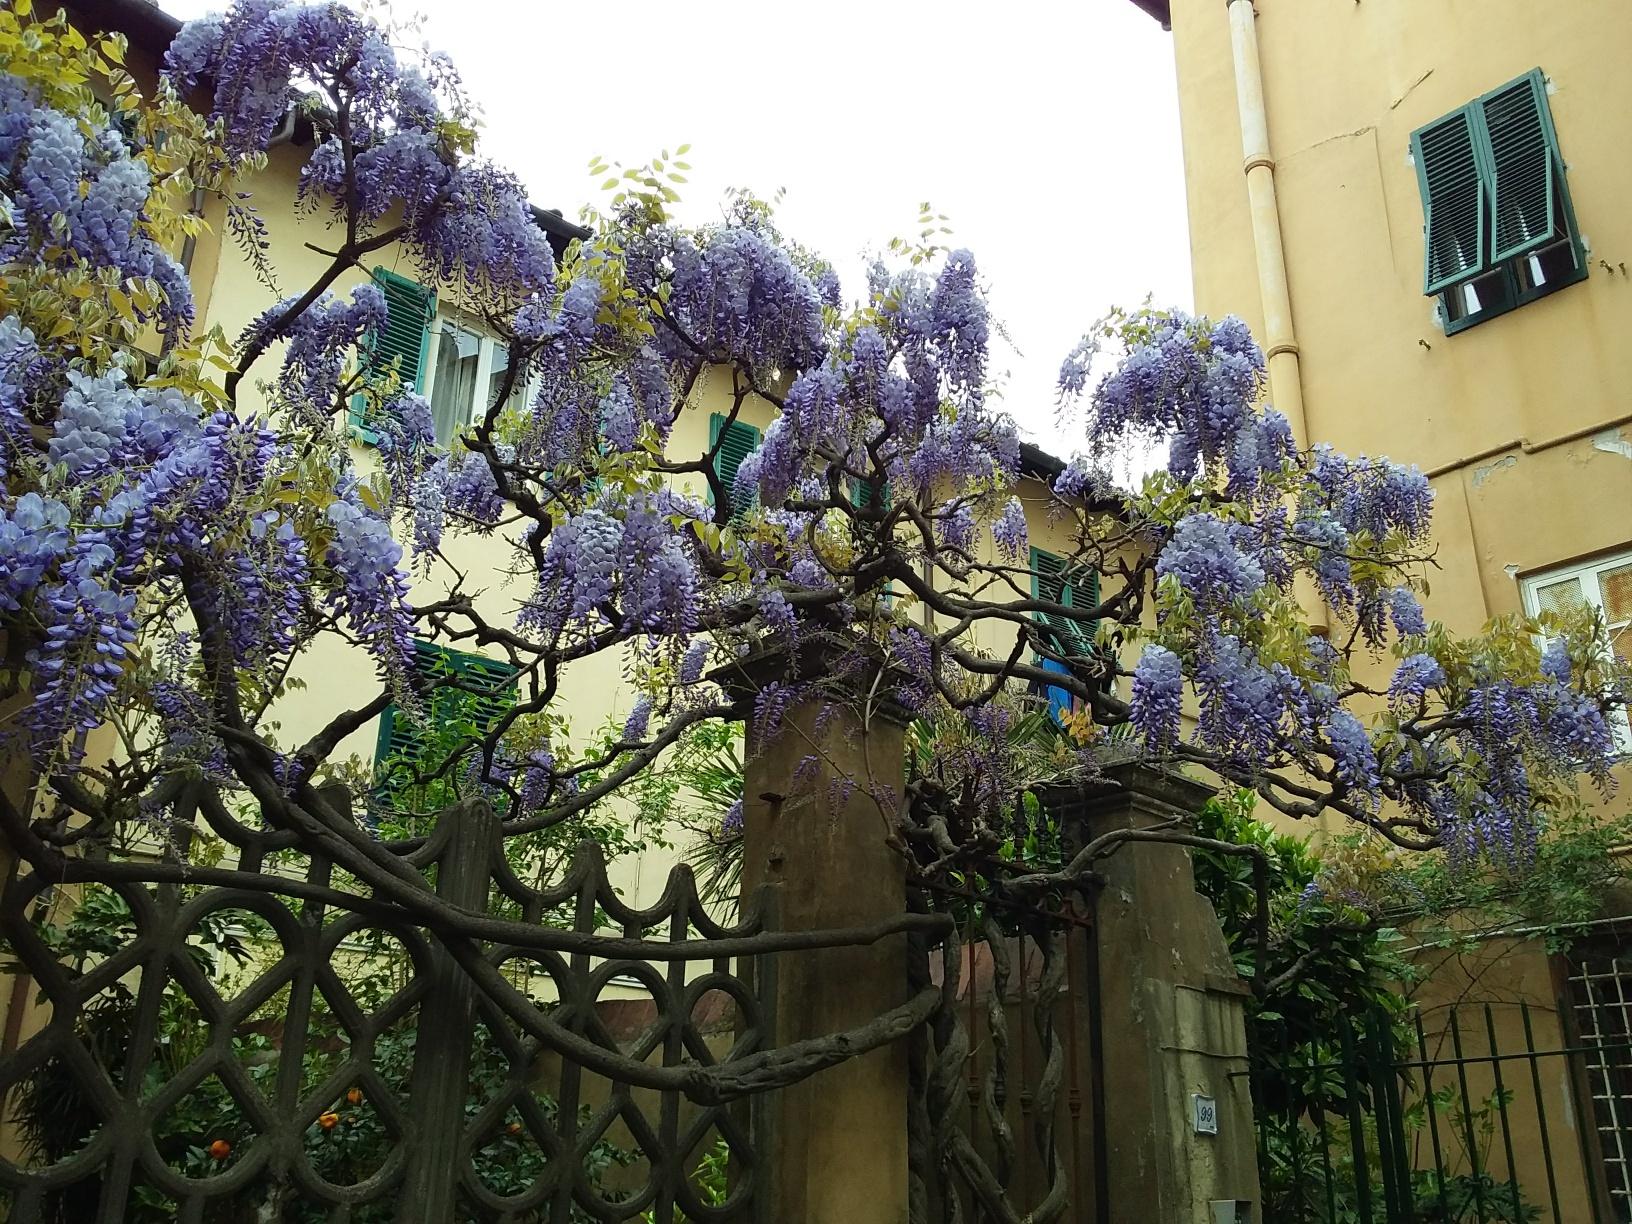 Wisteria in full bloom, Piazza Parigi, Lucca